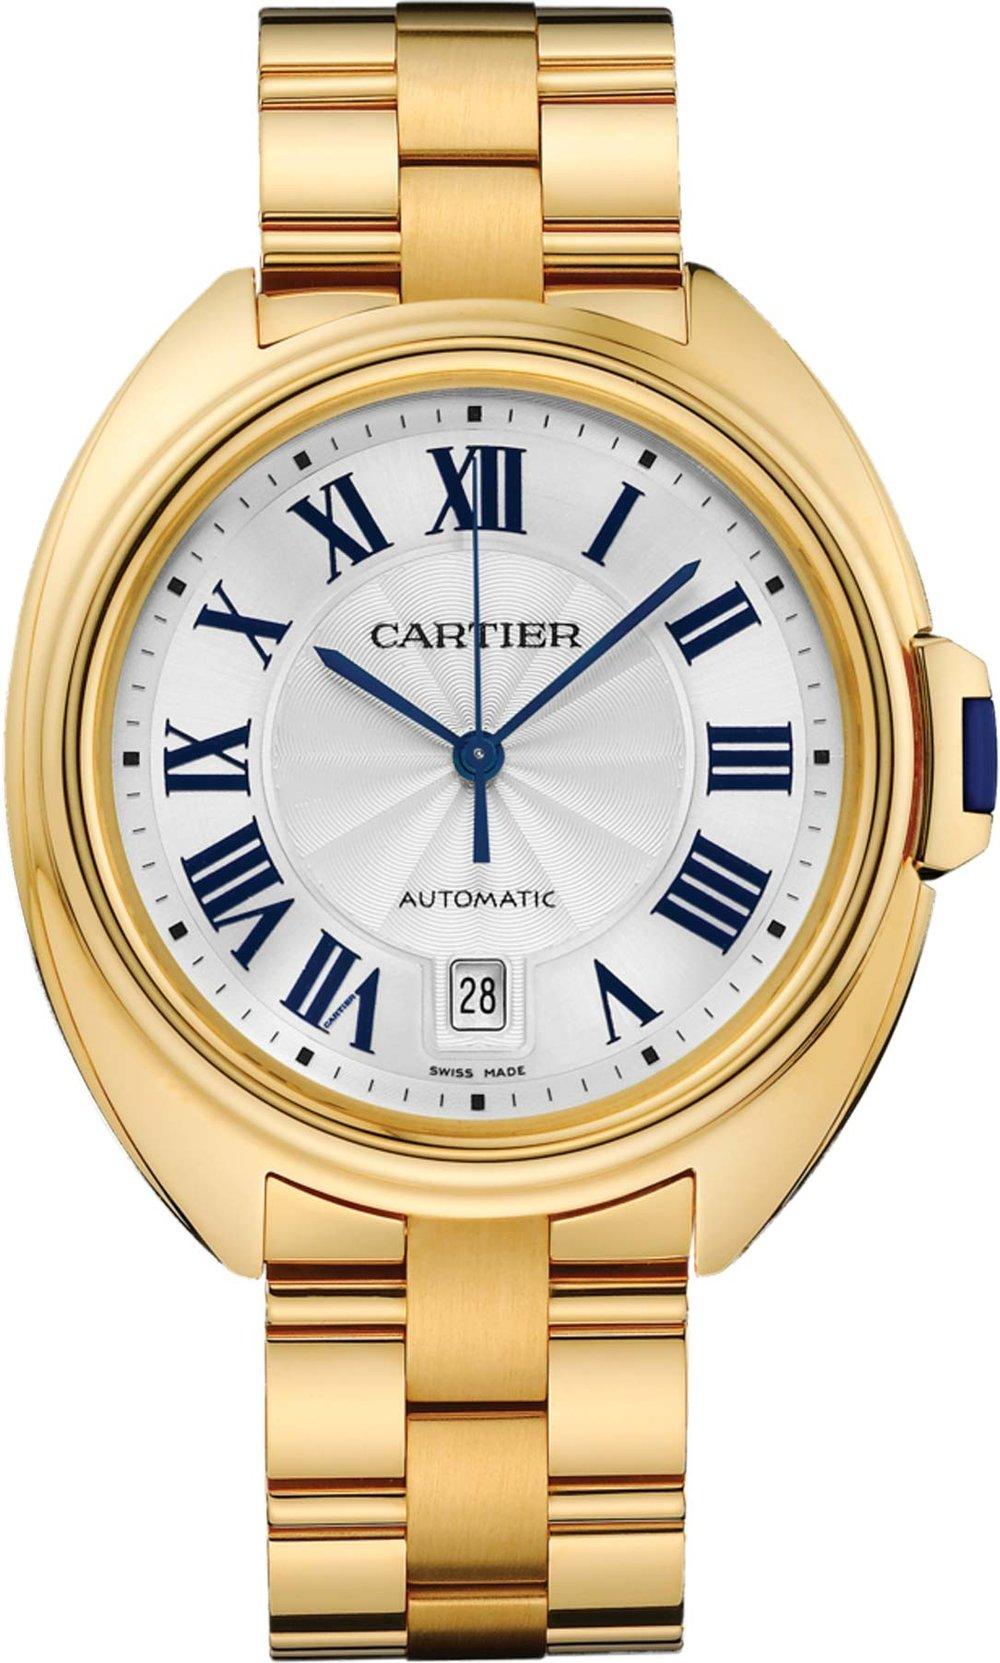 Clé de Cartier Watch by Cartier Price upon request 卡地亞腕錶